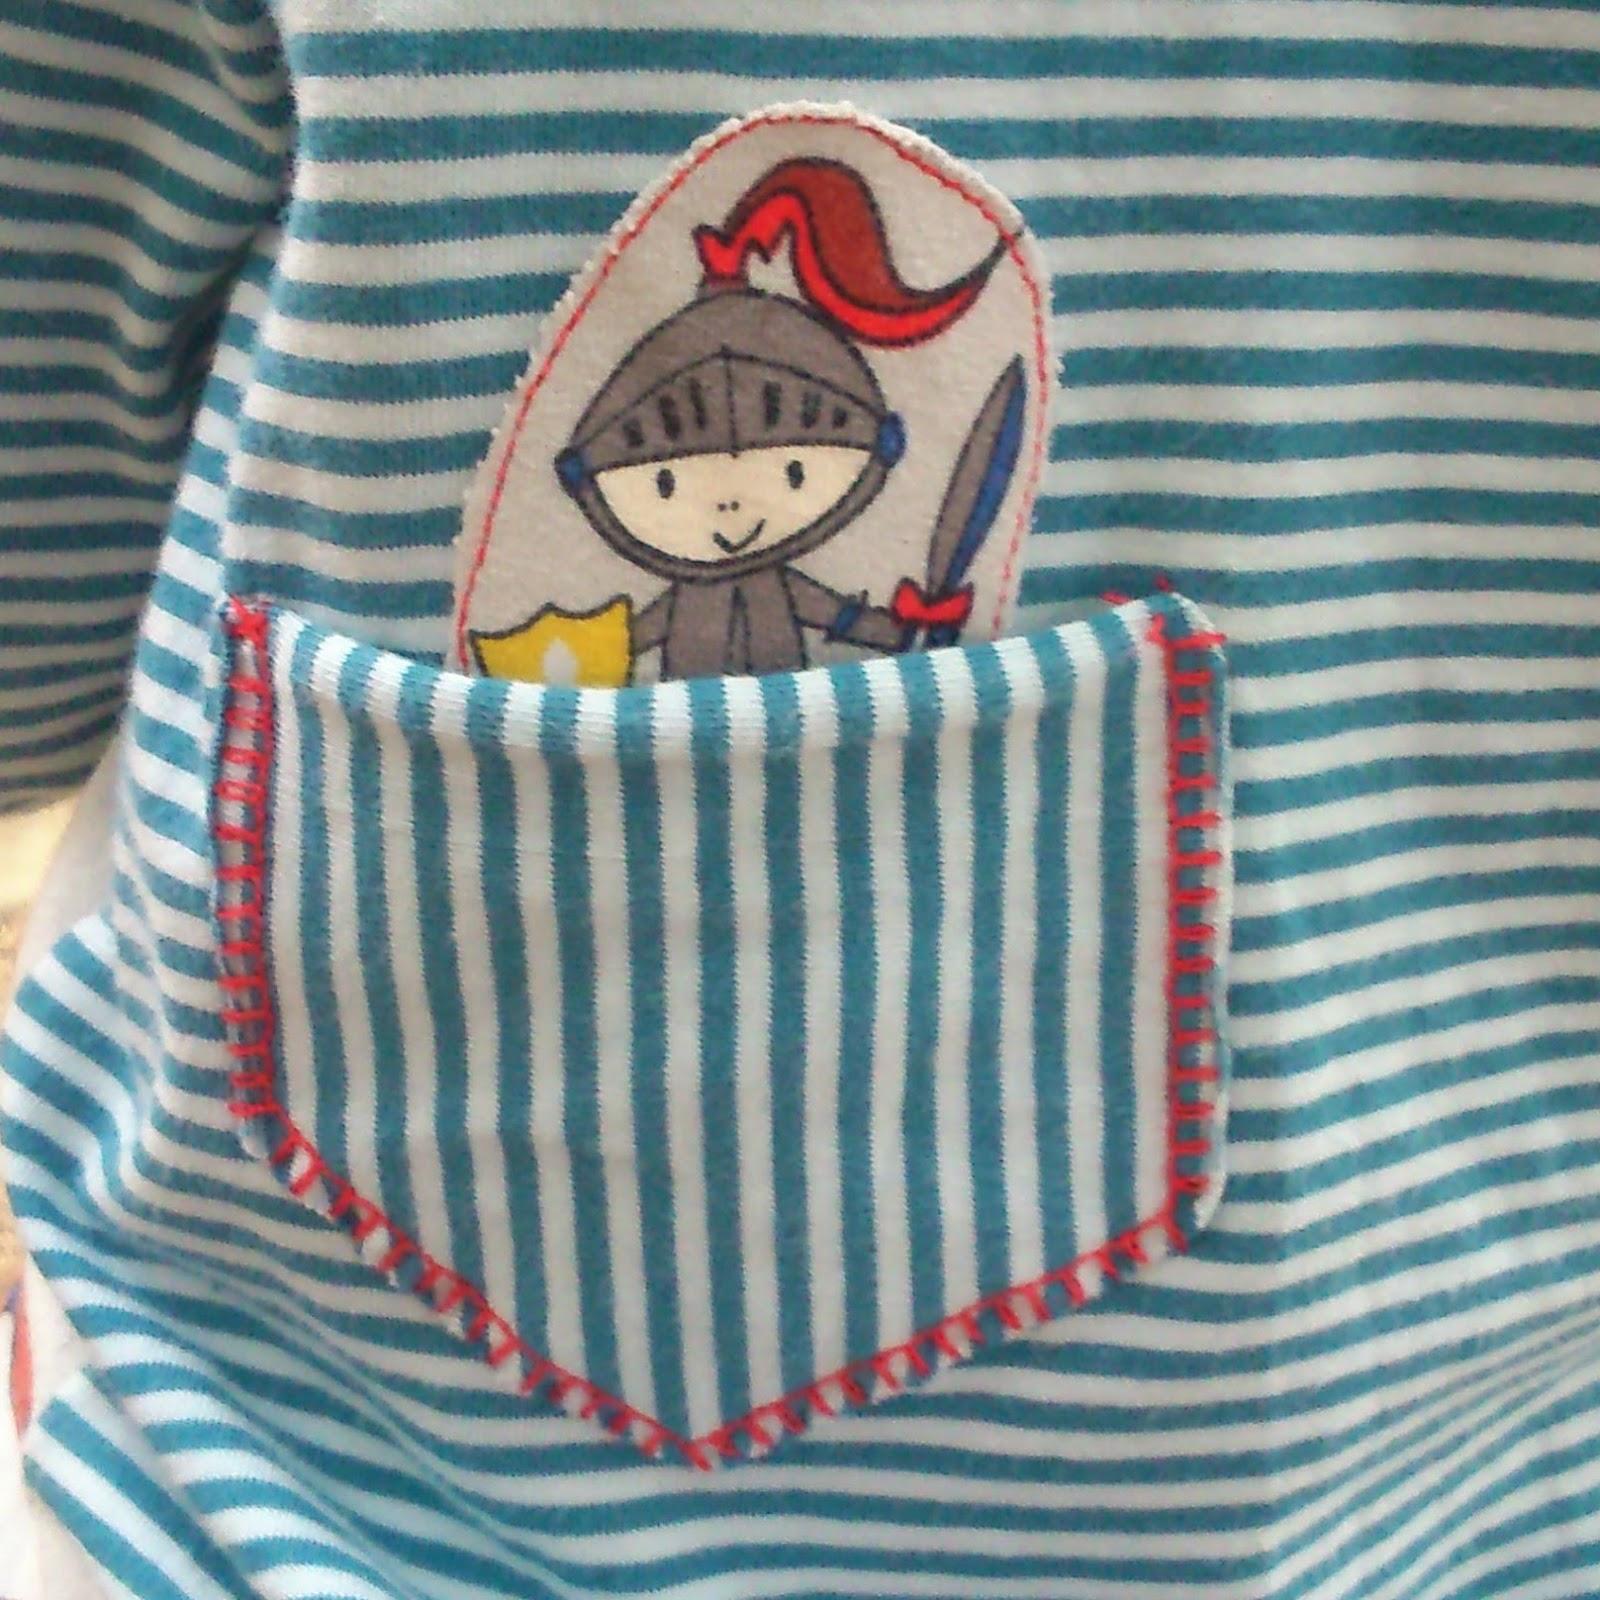 Pantlón y camiseta niño handmade